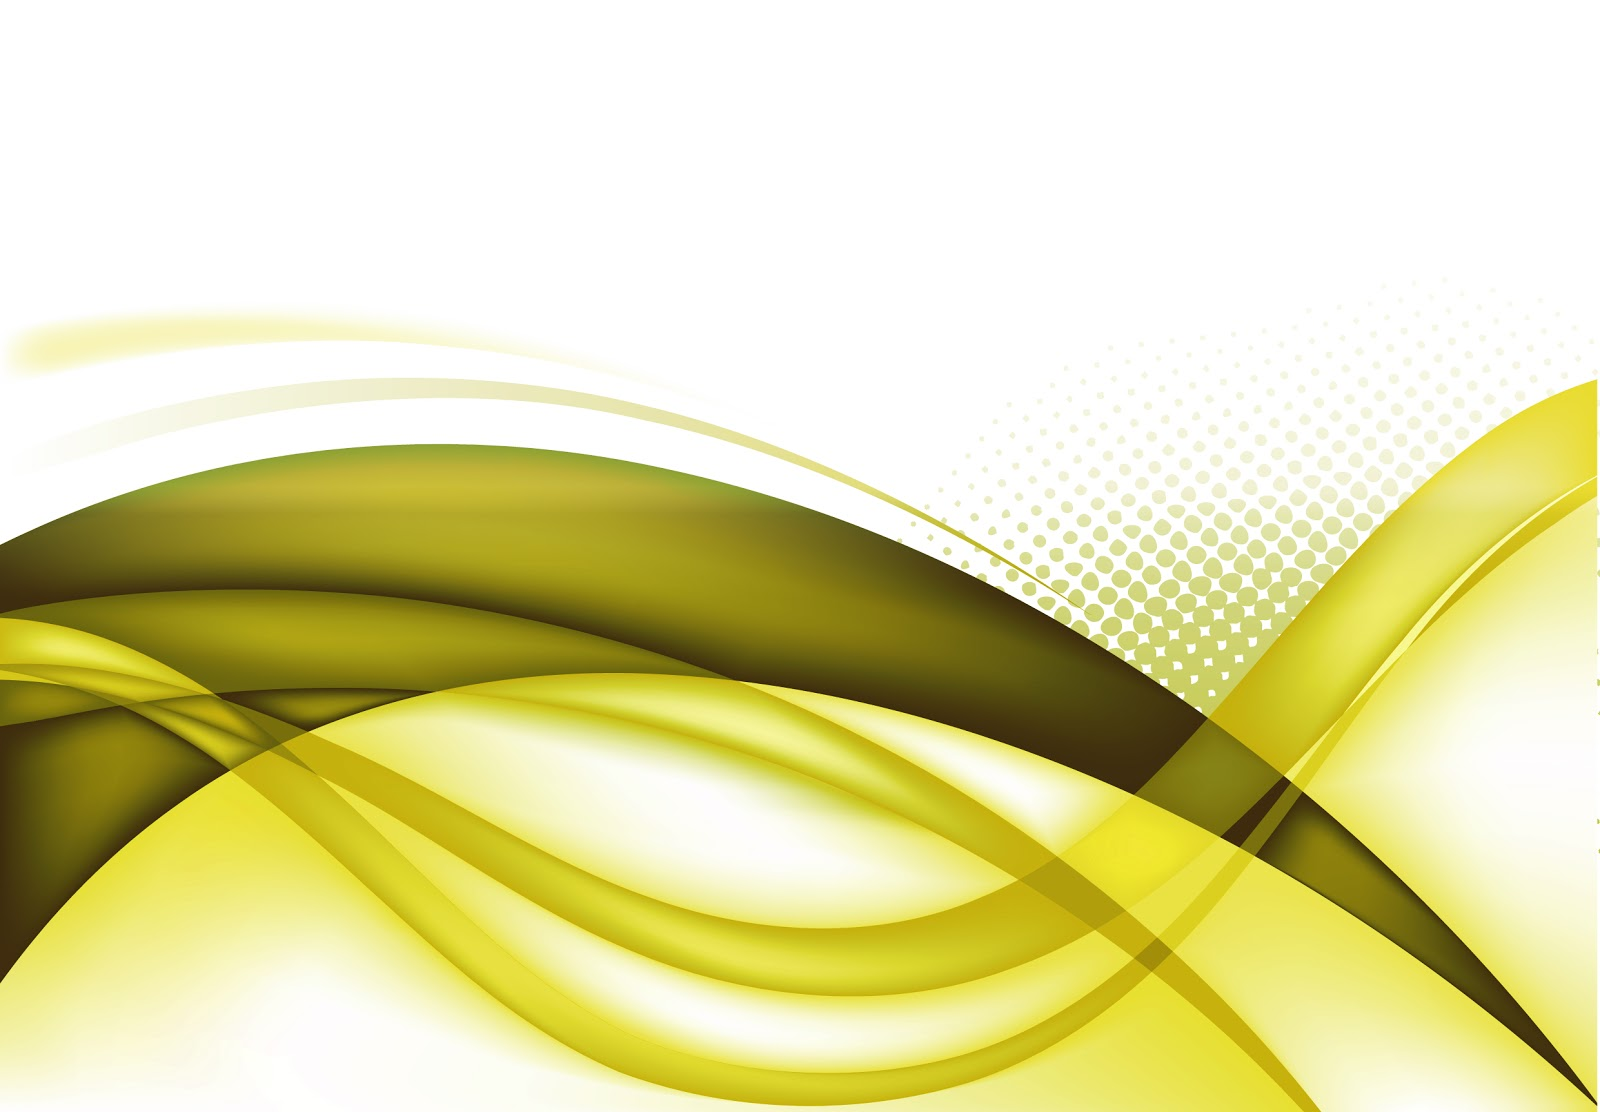 PSD Graphics: Beautiful yellow background